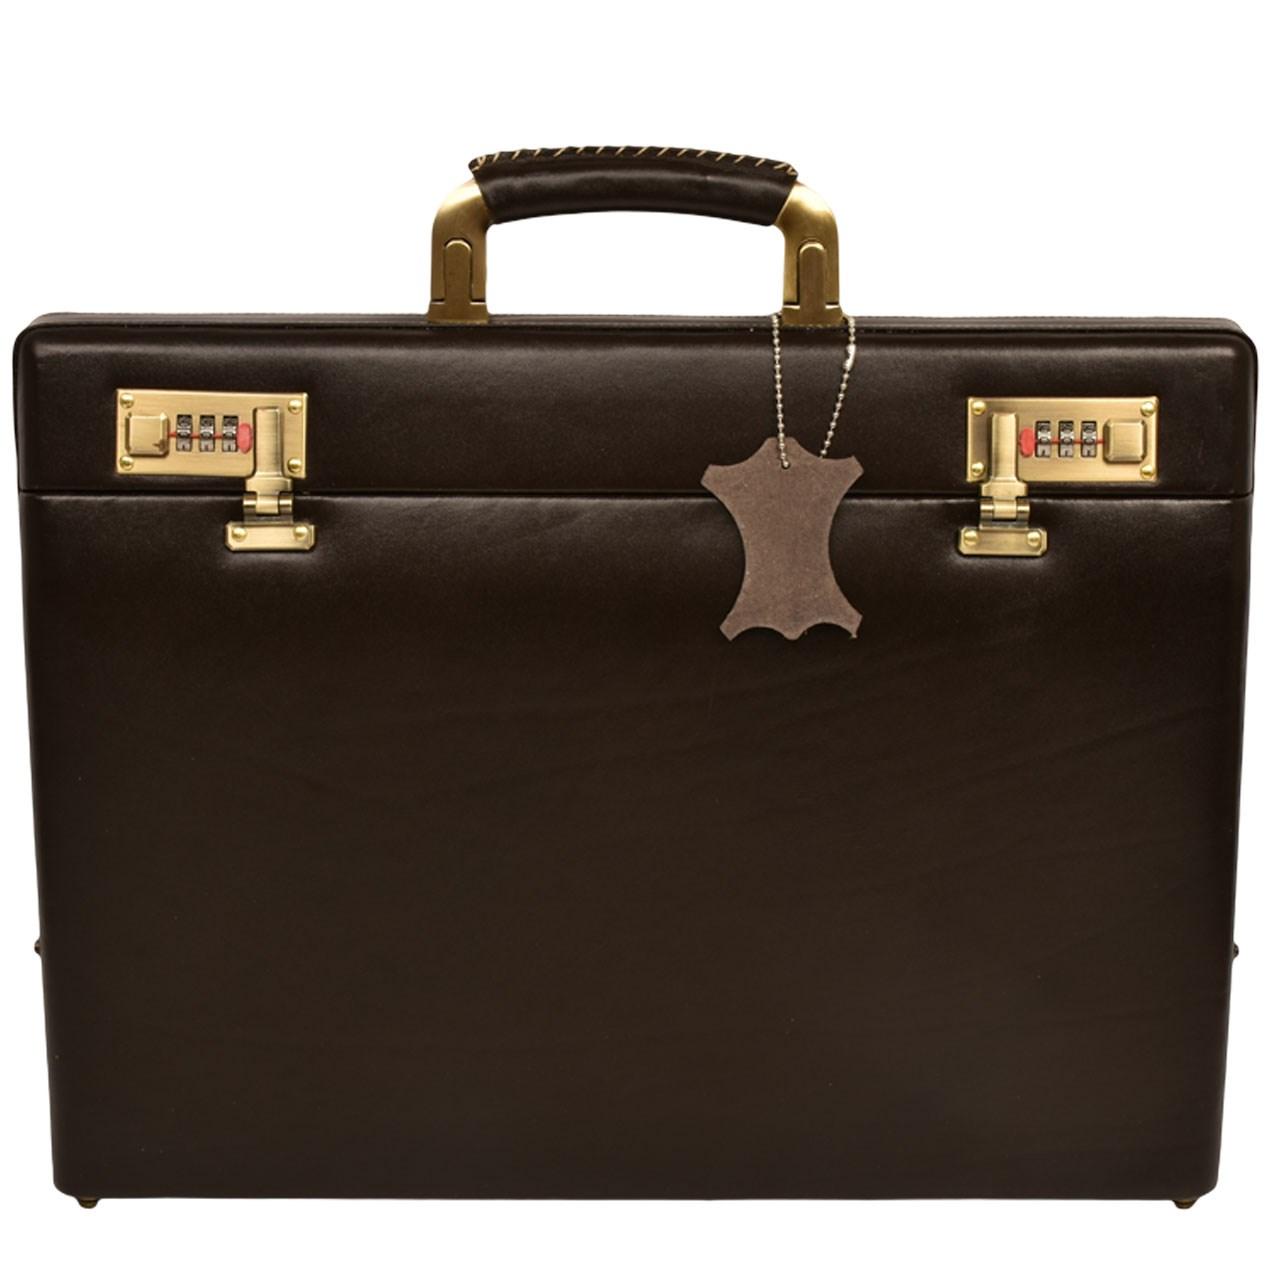 کیف اداری چرم طبیعی کهن چرم مدل L72-15